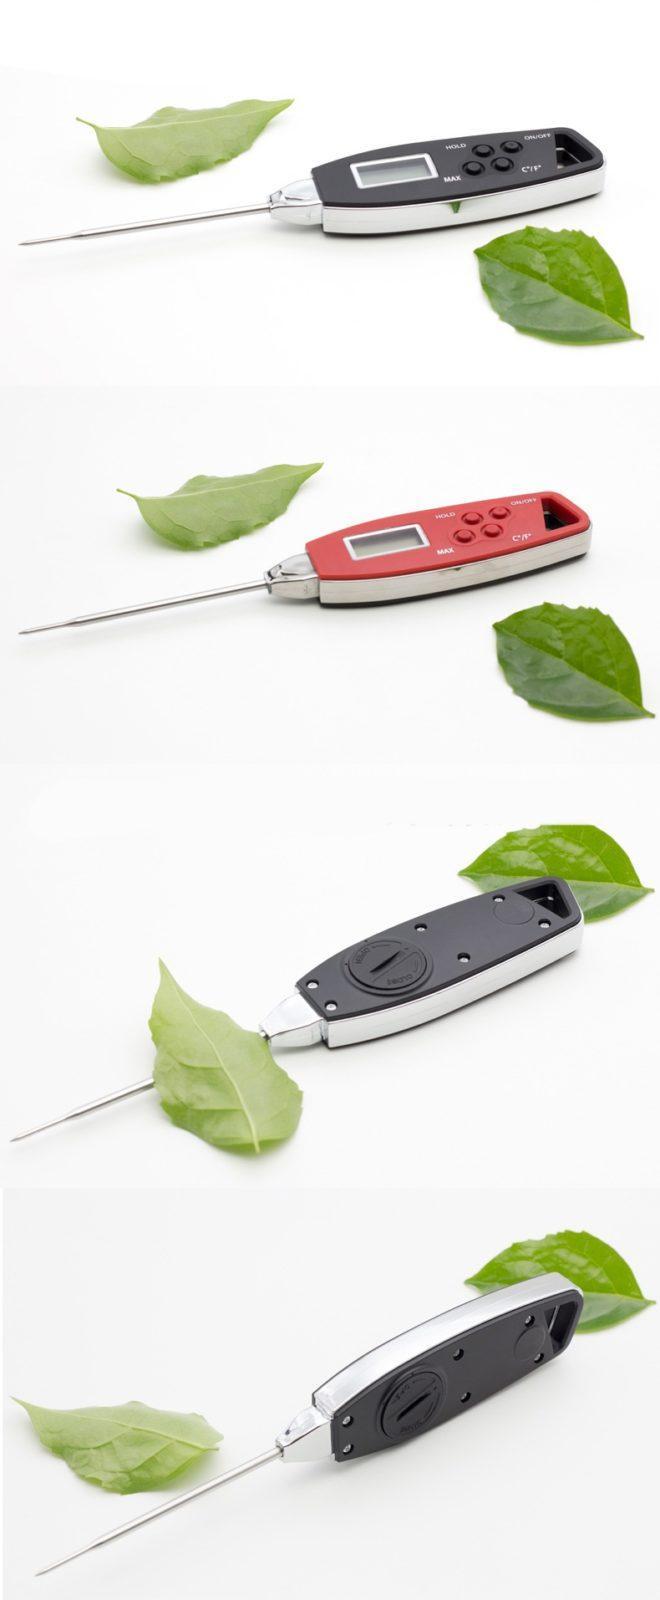 kuhonnyj termometr jelektronnyj kitchenhelper 02 - Кухонный термометр электронный KitchenHelper